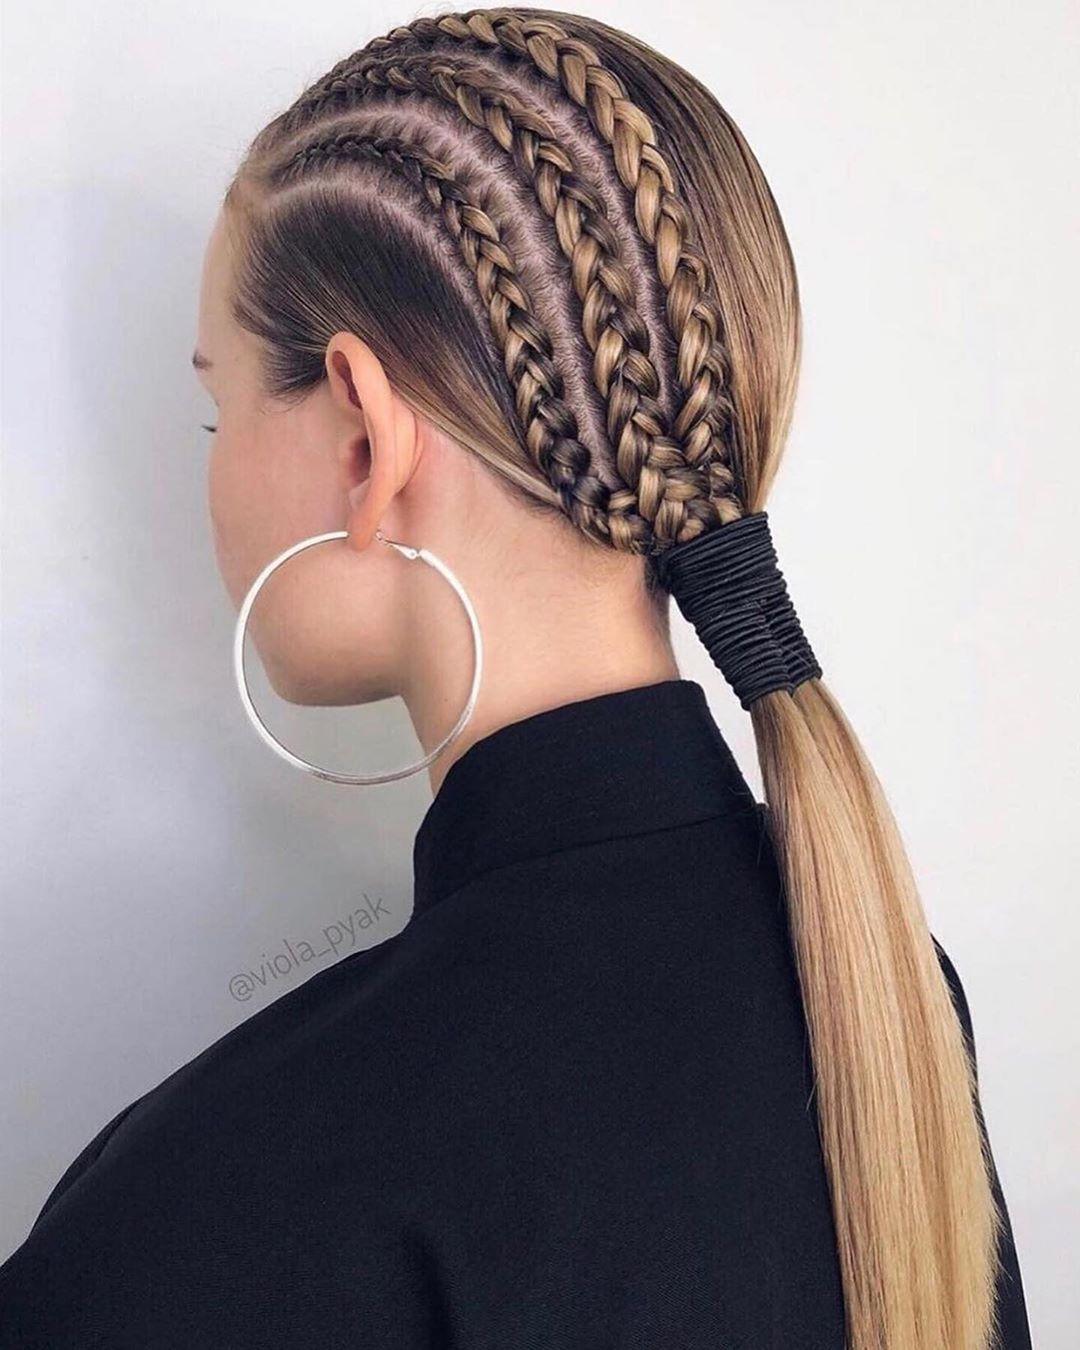 Instagram Da Hair Tutorials Via Viola Pyak Easy Hairstyles For Long Hair Braided Hairstyles Long Hair Styles